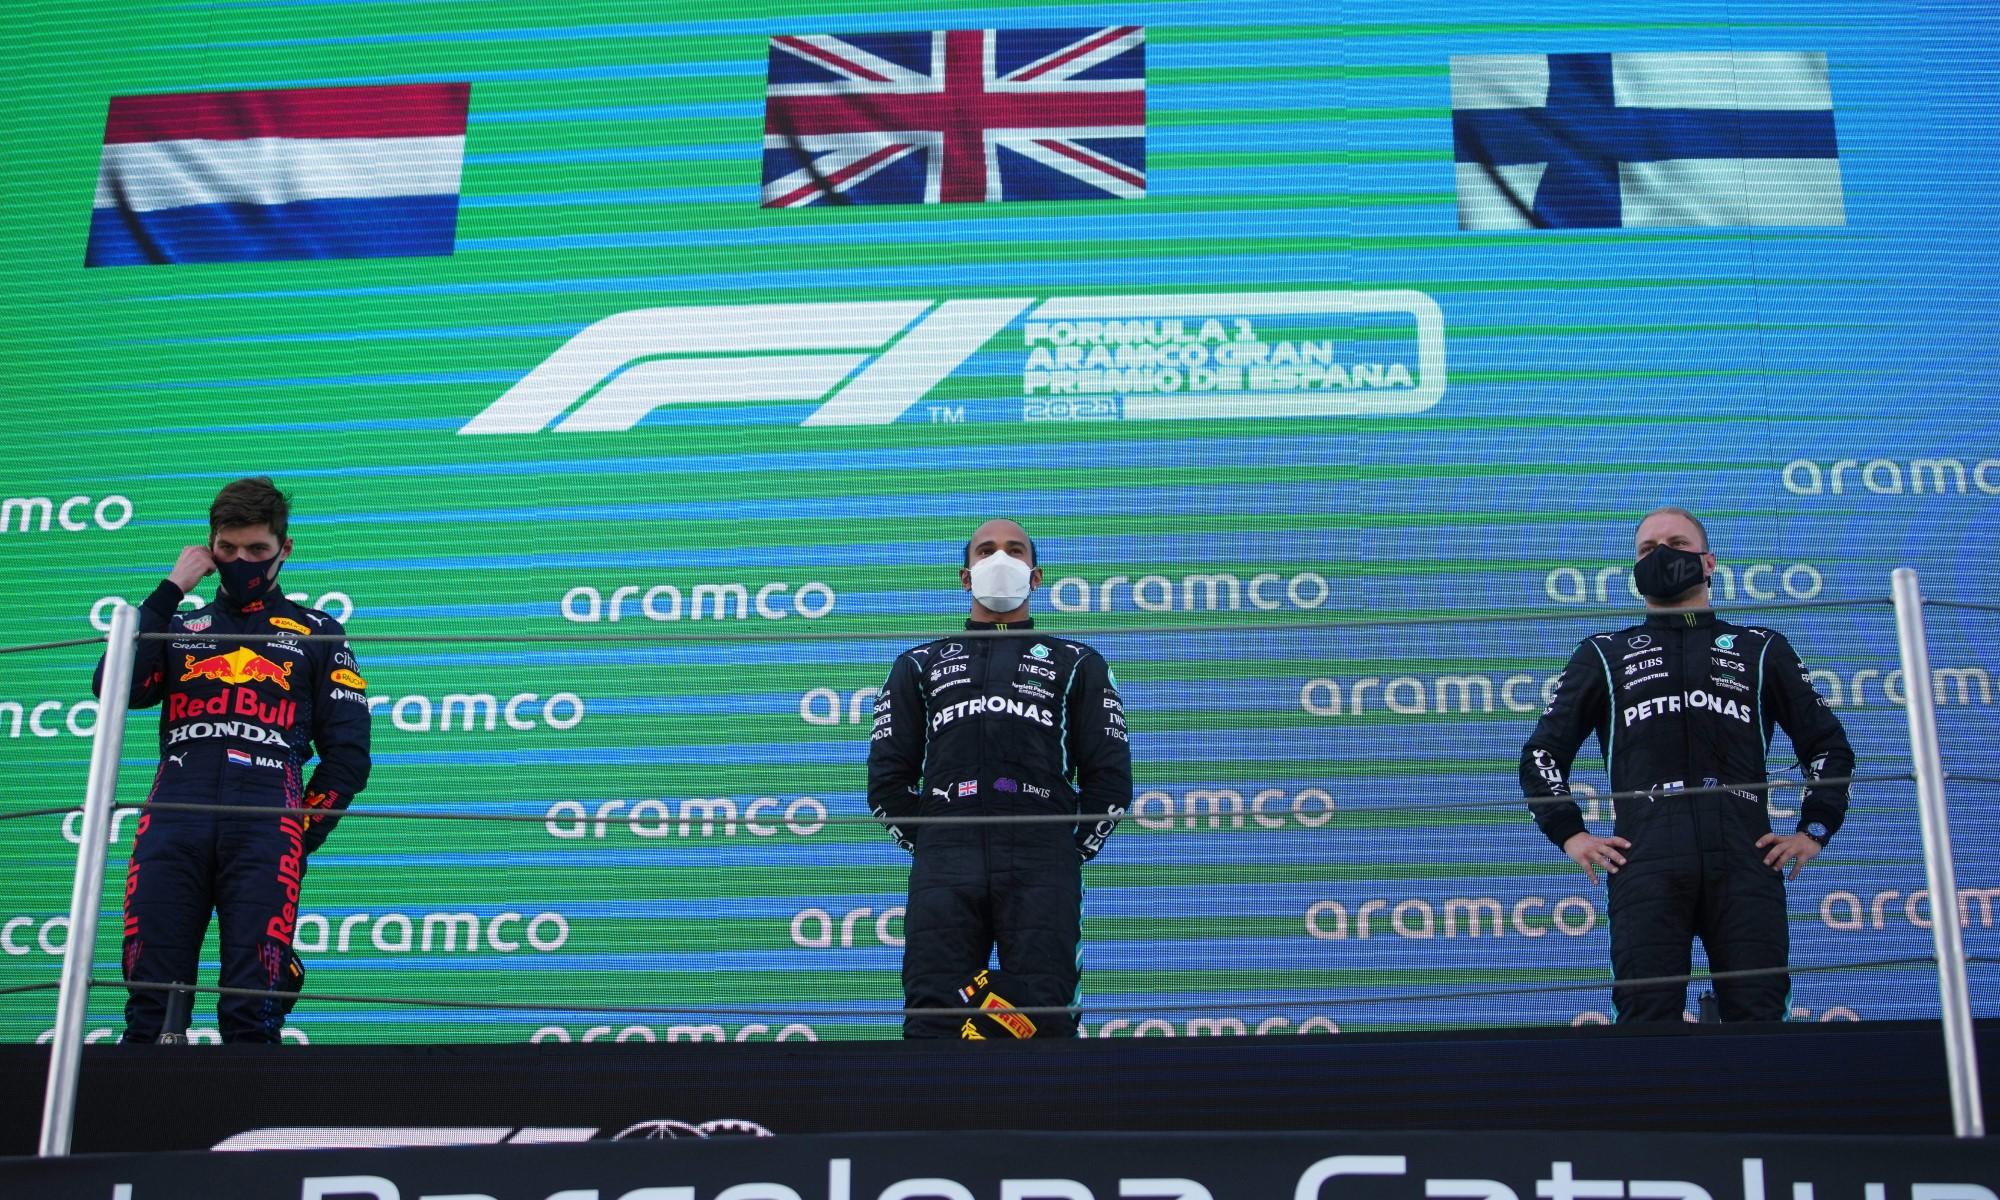 F1 Review Spain 2021 podium